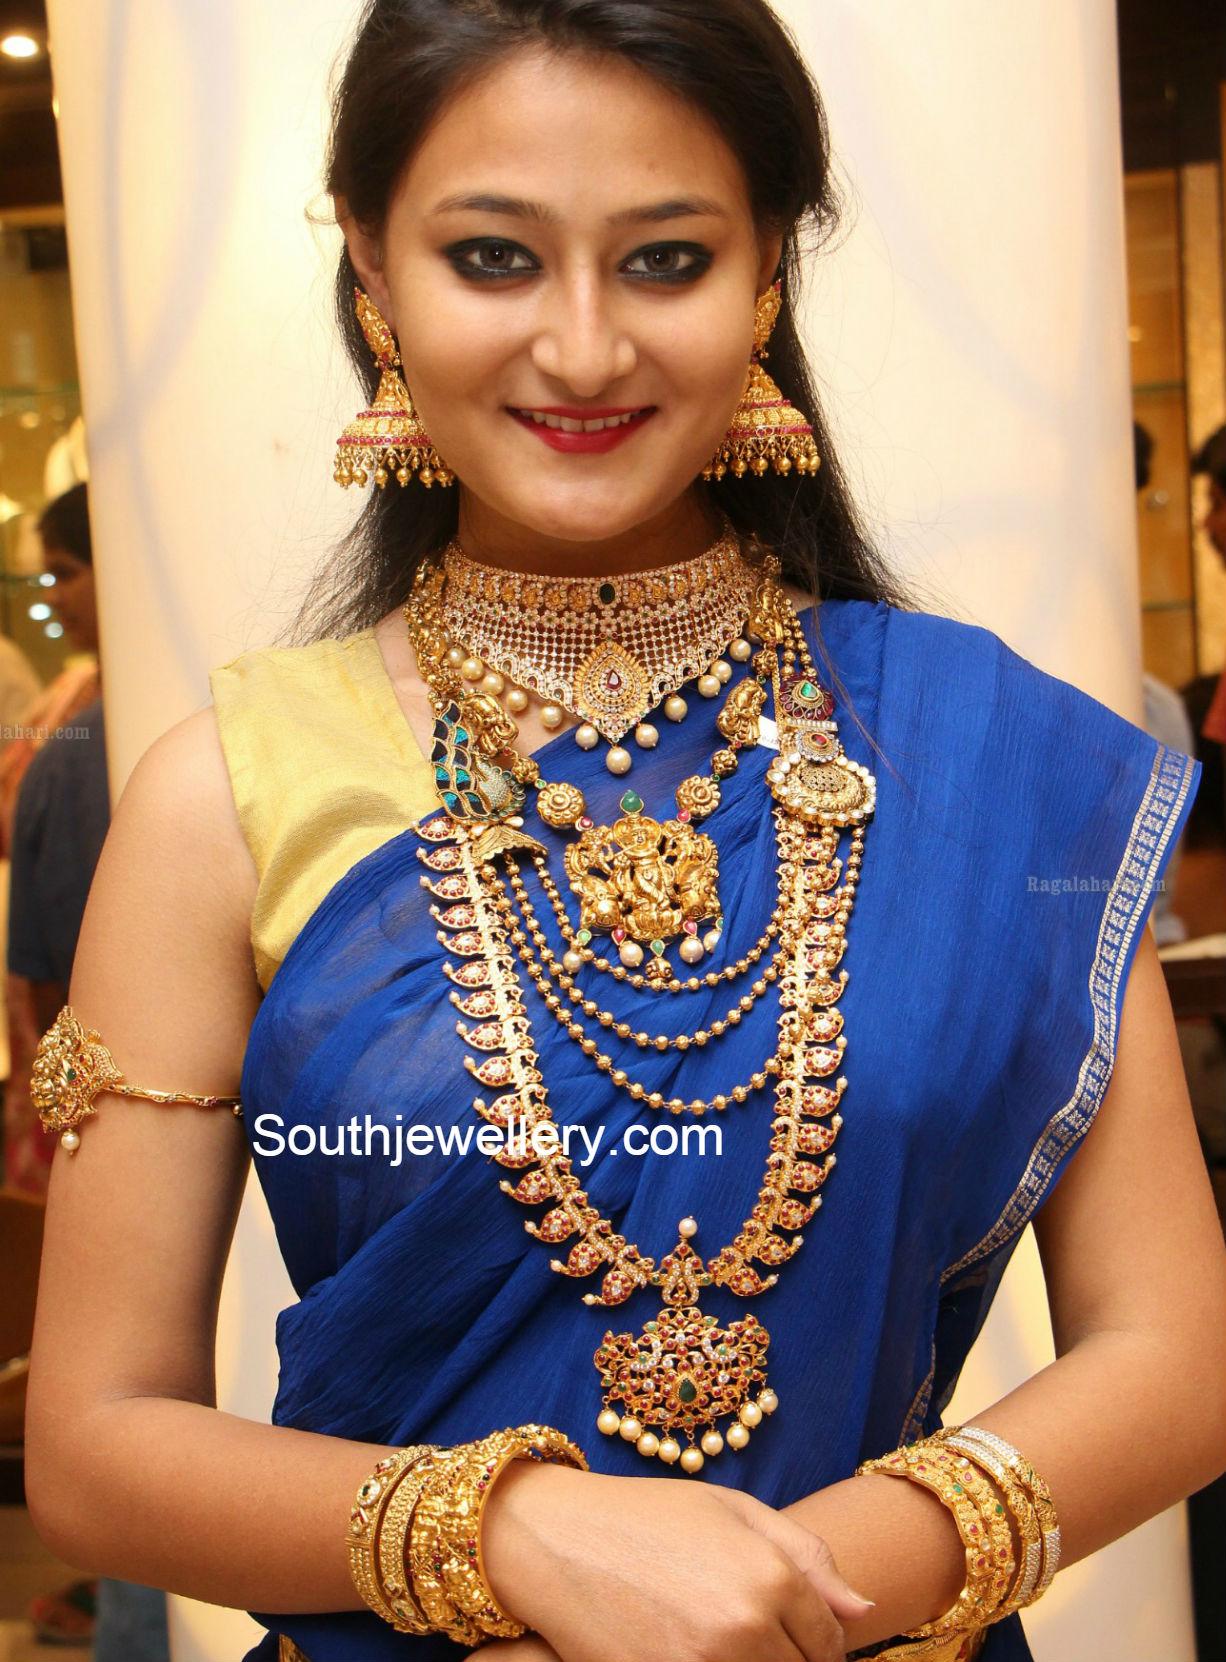 Suhasini in gundla haram jewellery designs - Manepally S Temple Jewellery Collection